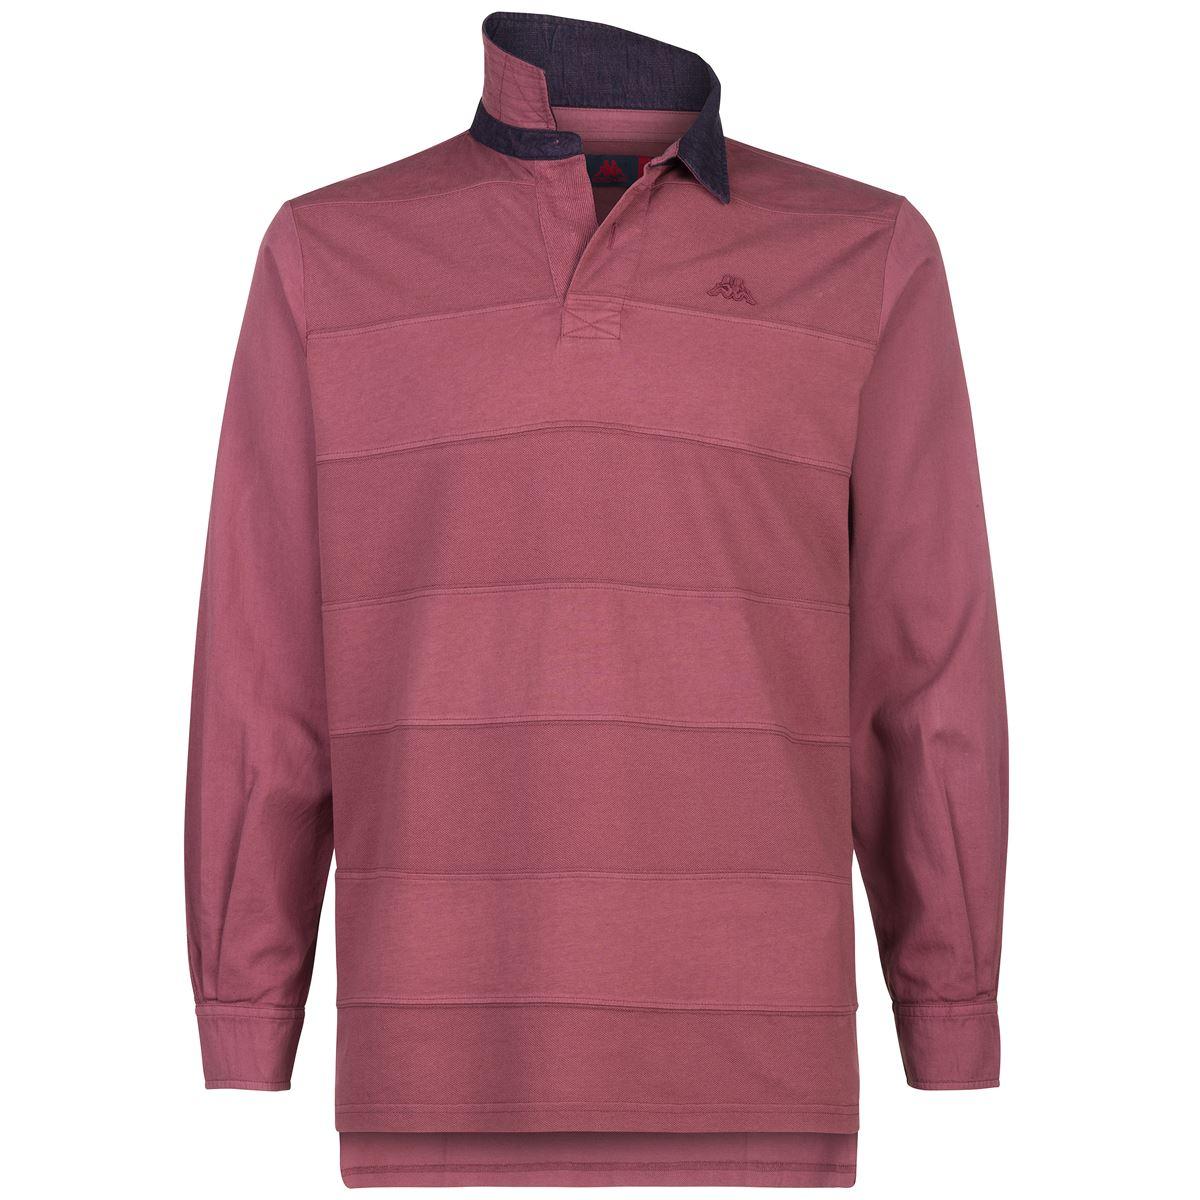 Robe di Kappa Polo Shirts uomo-601NN30